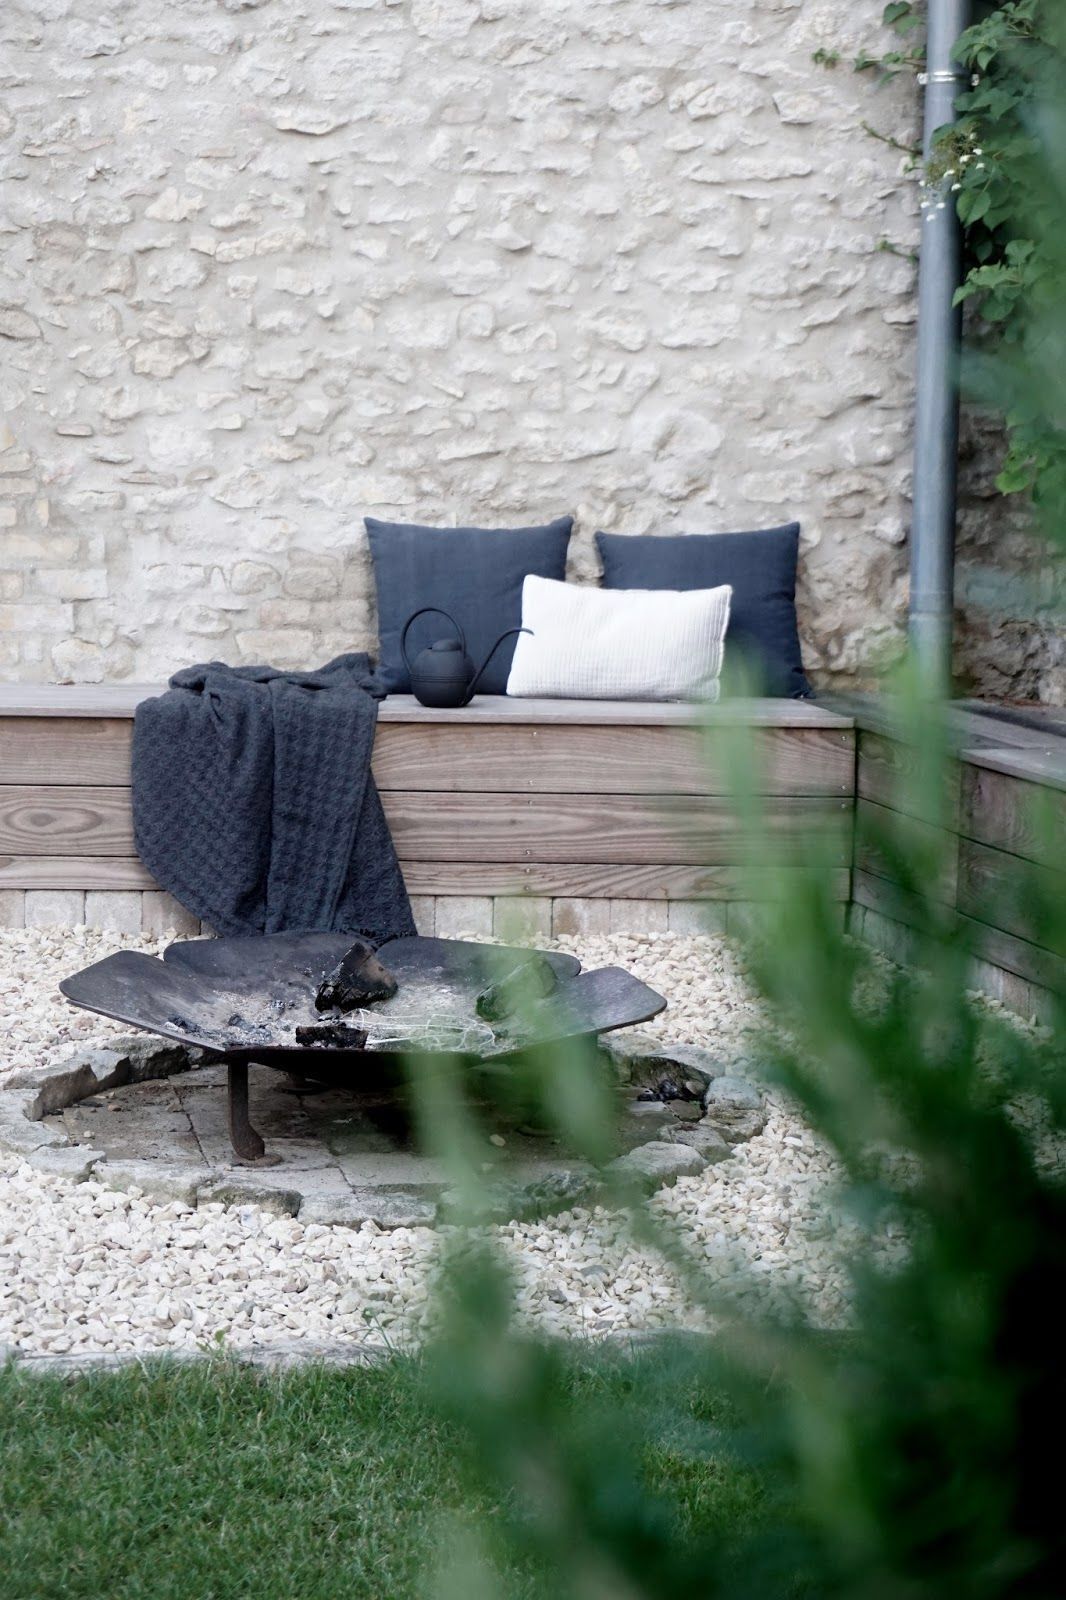 pingl par eleah galler sur let 39 s live outside pinterest terrasses chemin e et jardins. Black Bedroom Furniture Sets. Home Design Ideas